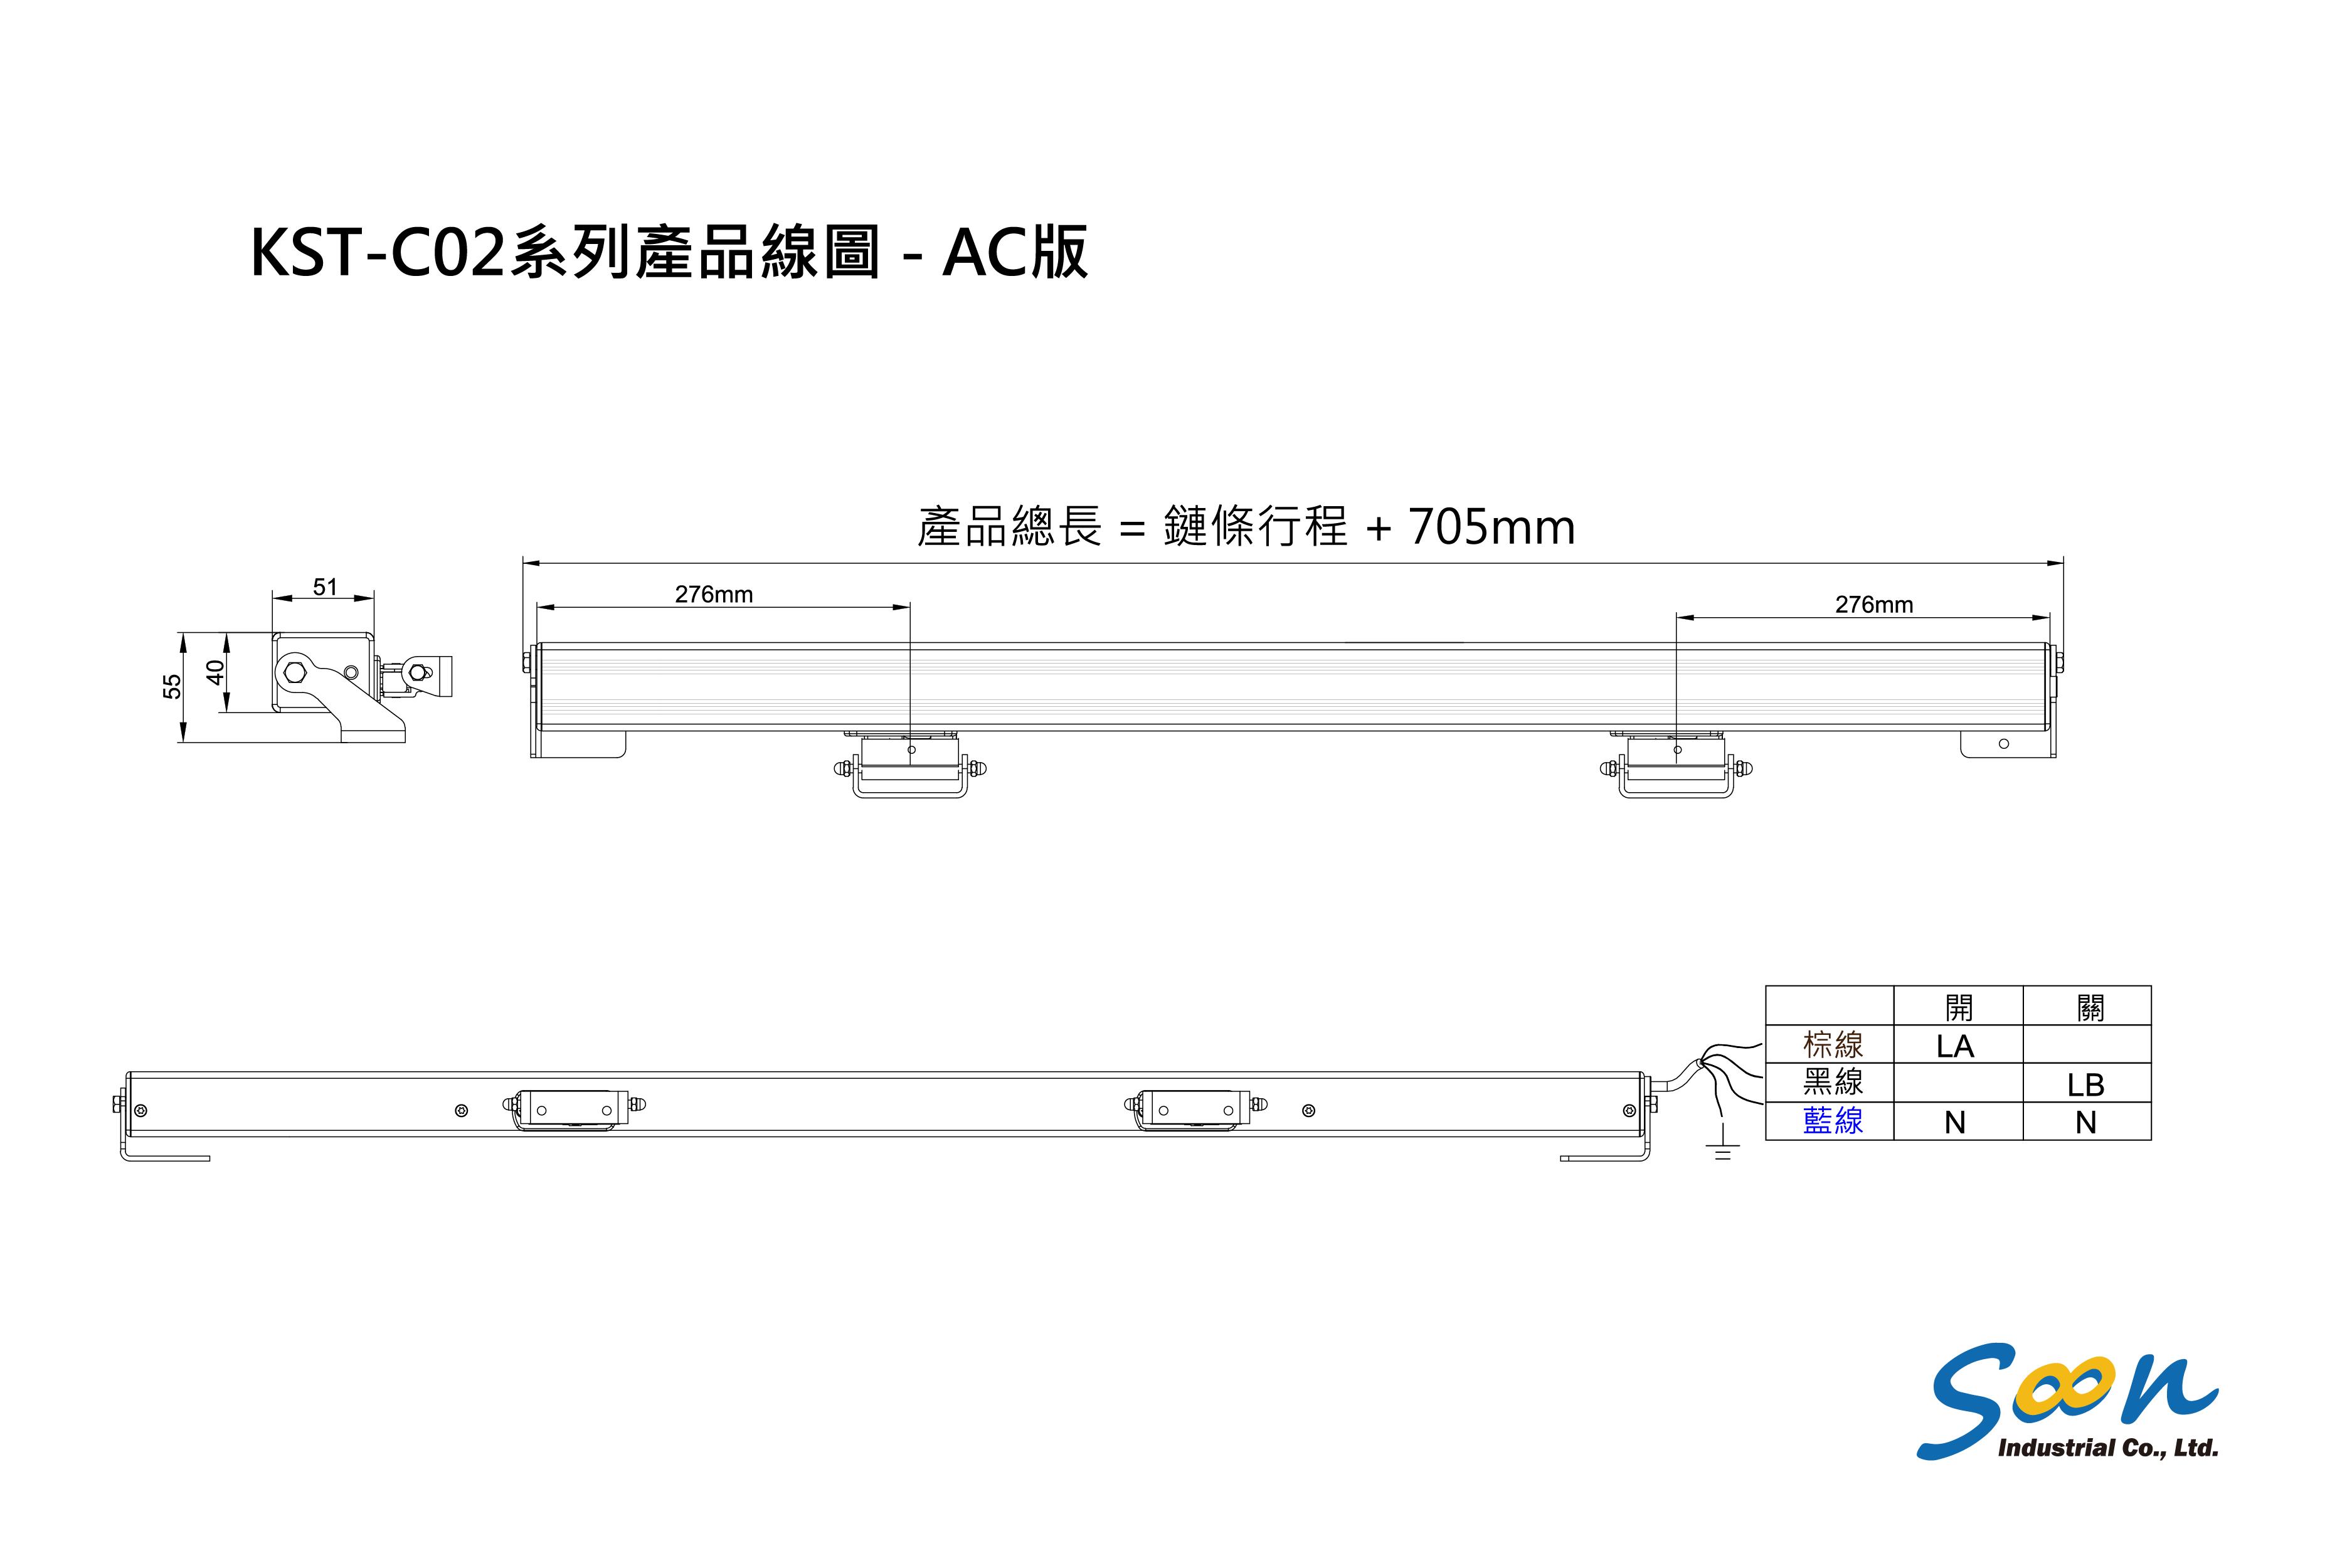 KST-C02雙鏈式電動推桿_AC版_產品尺寸圖